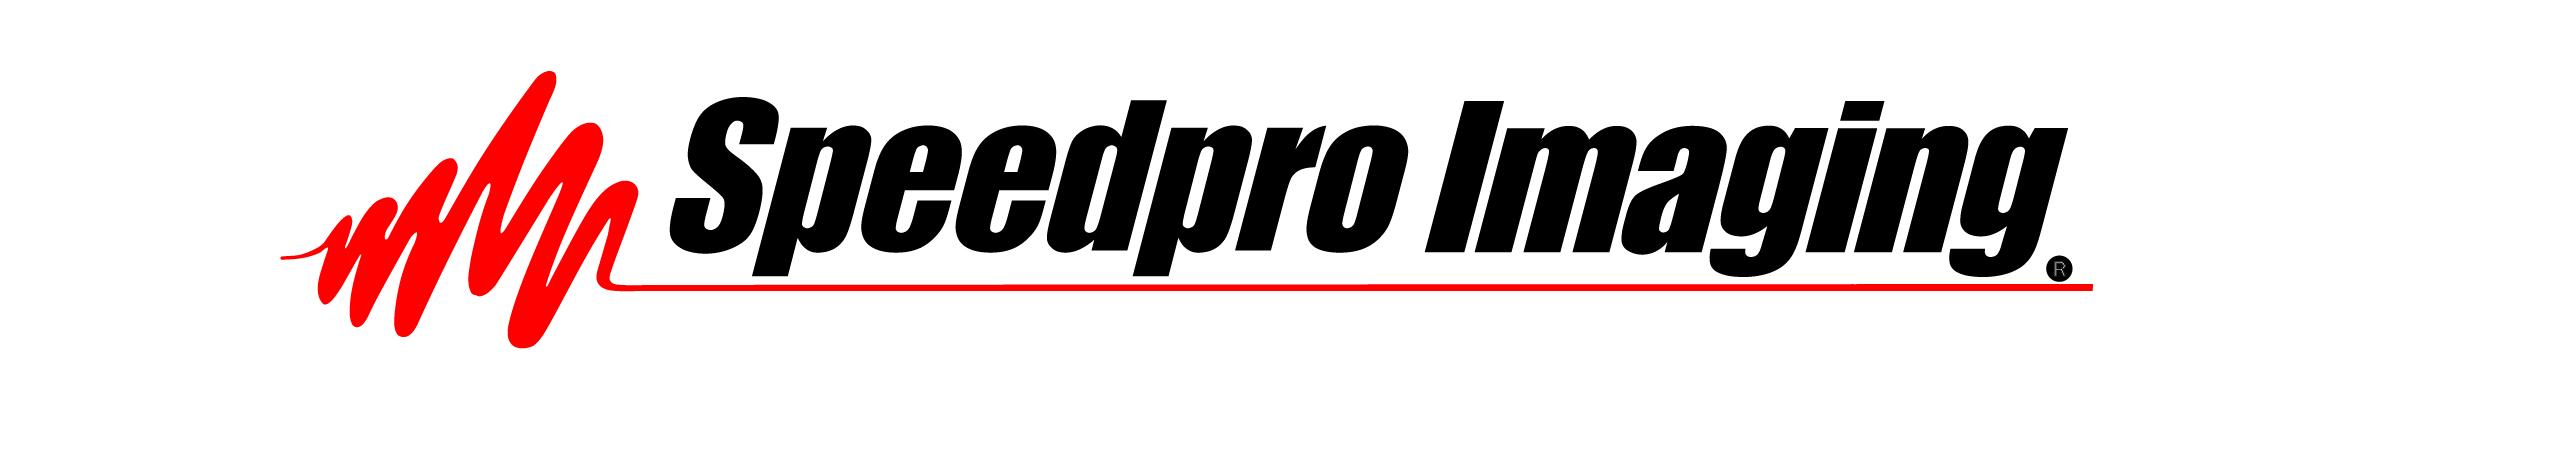 Speedpro Imaging